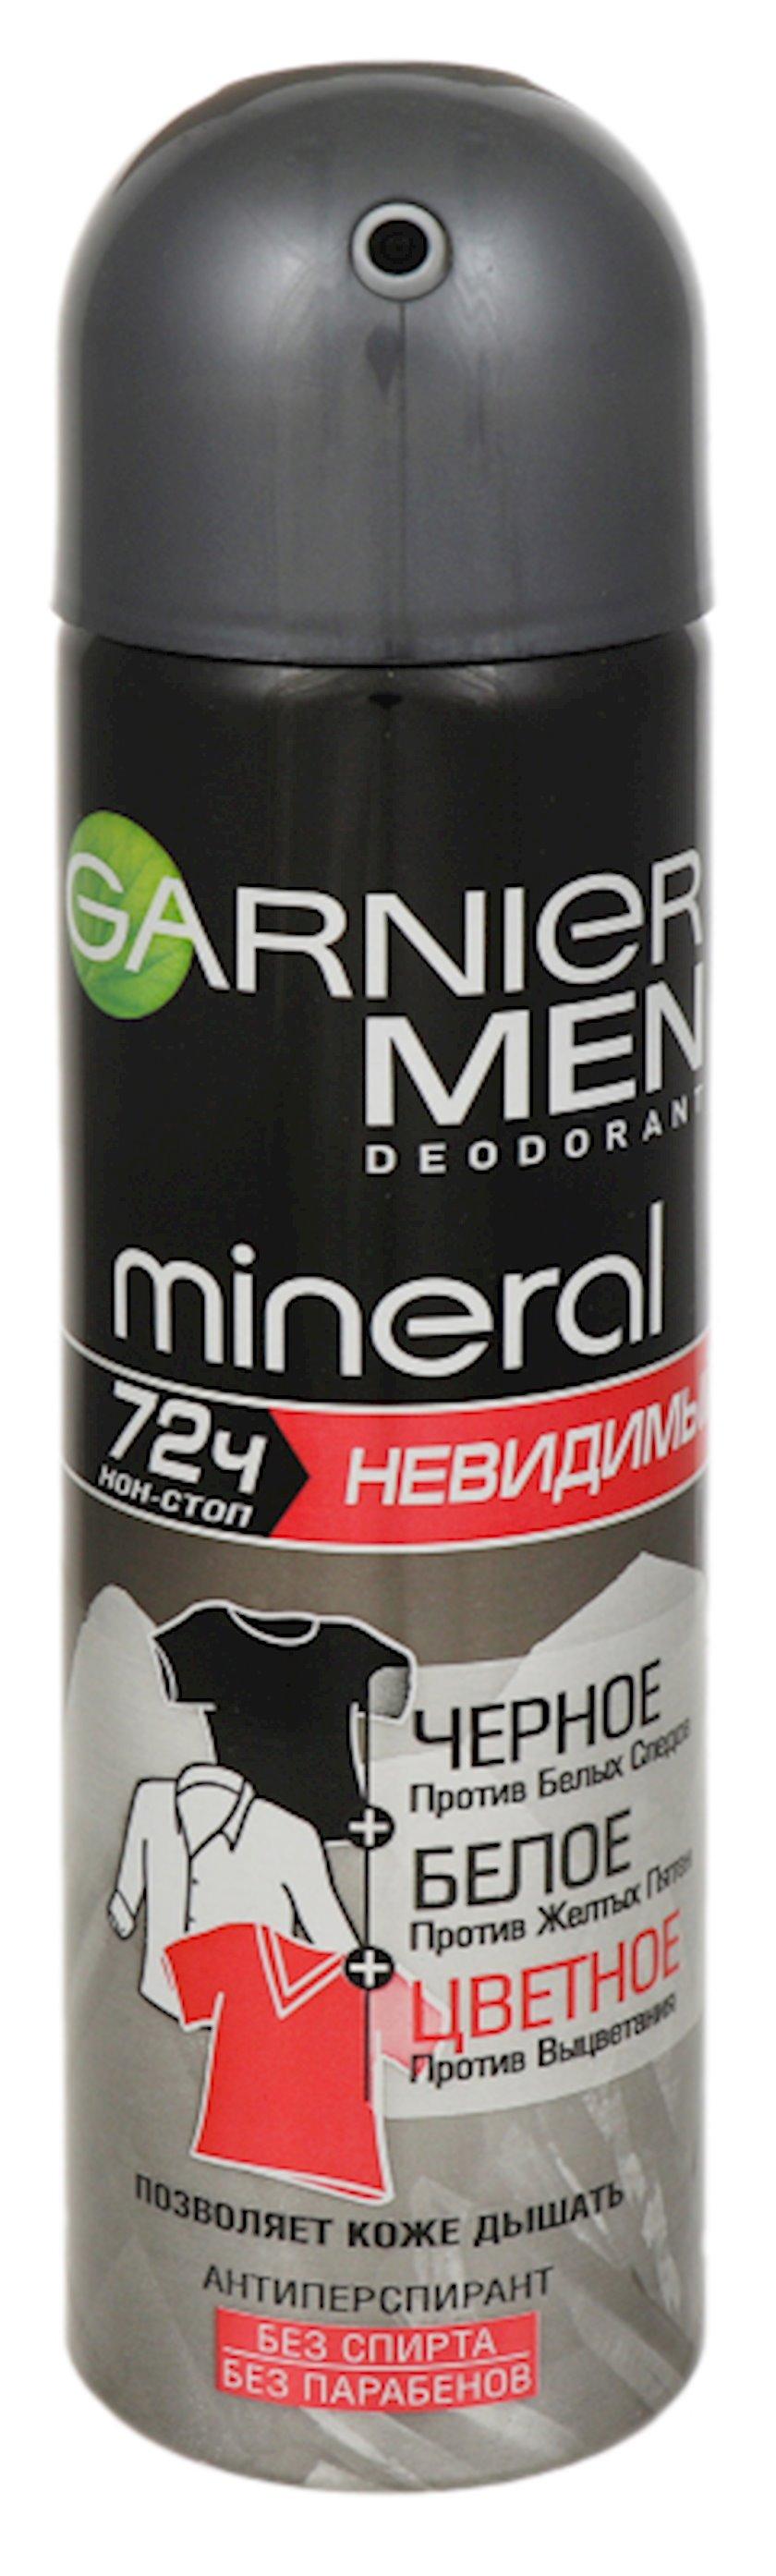 Dezodorant-antiperspirant Garnier Men Mineral Qara, ağ, rəngli, 150 ml